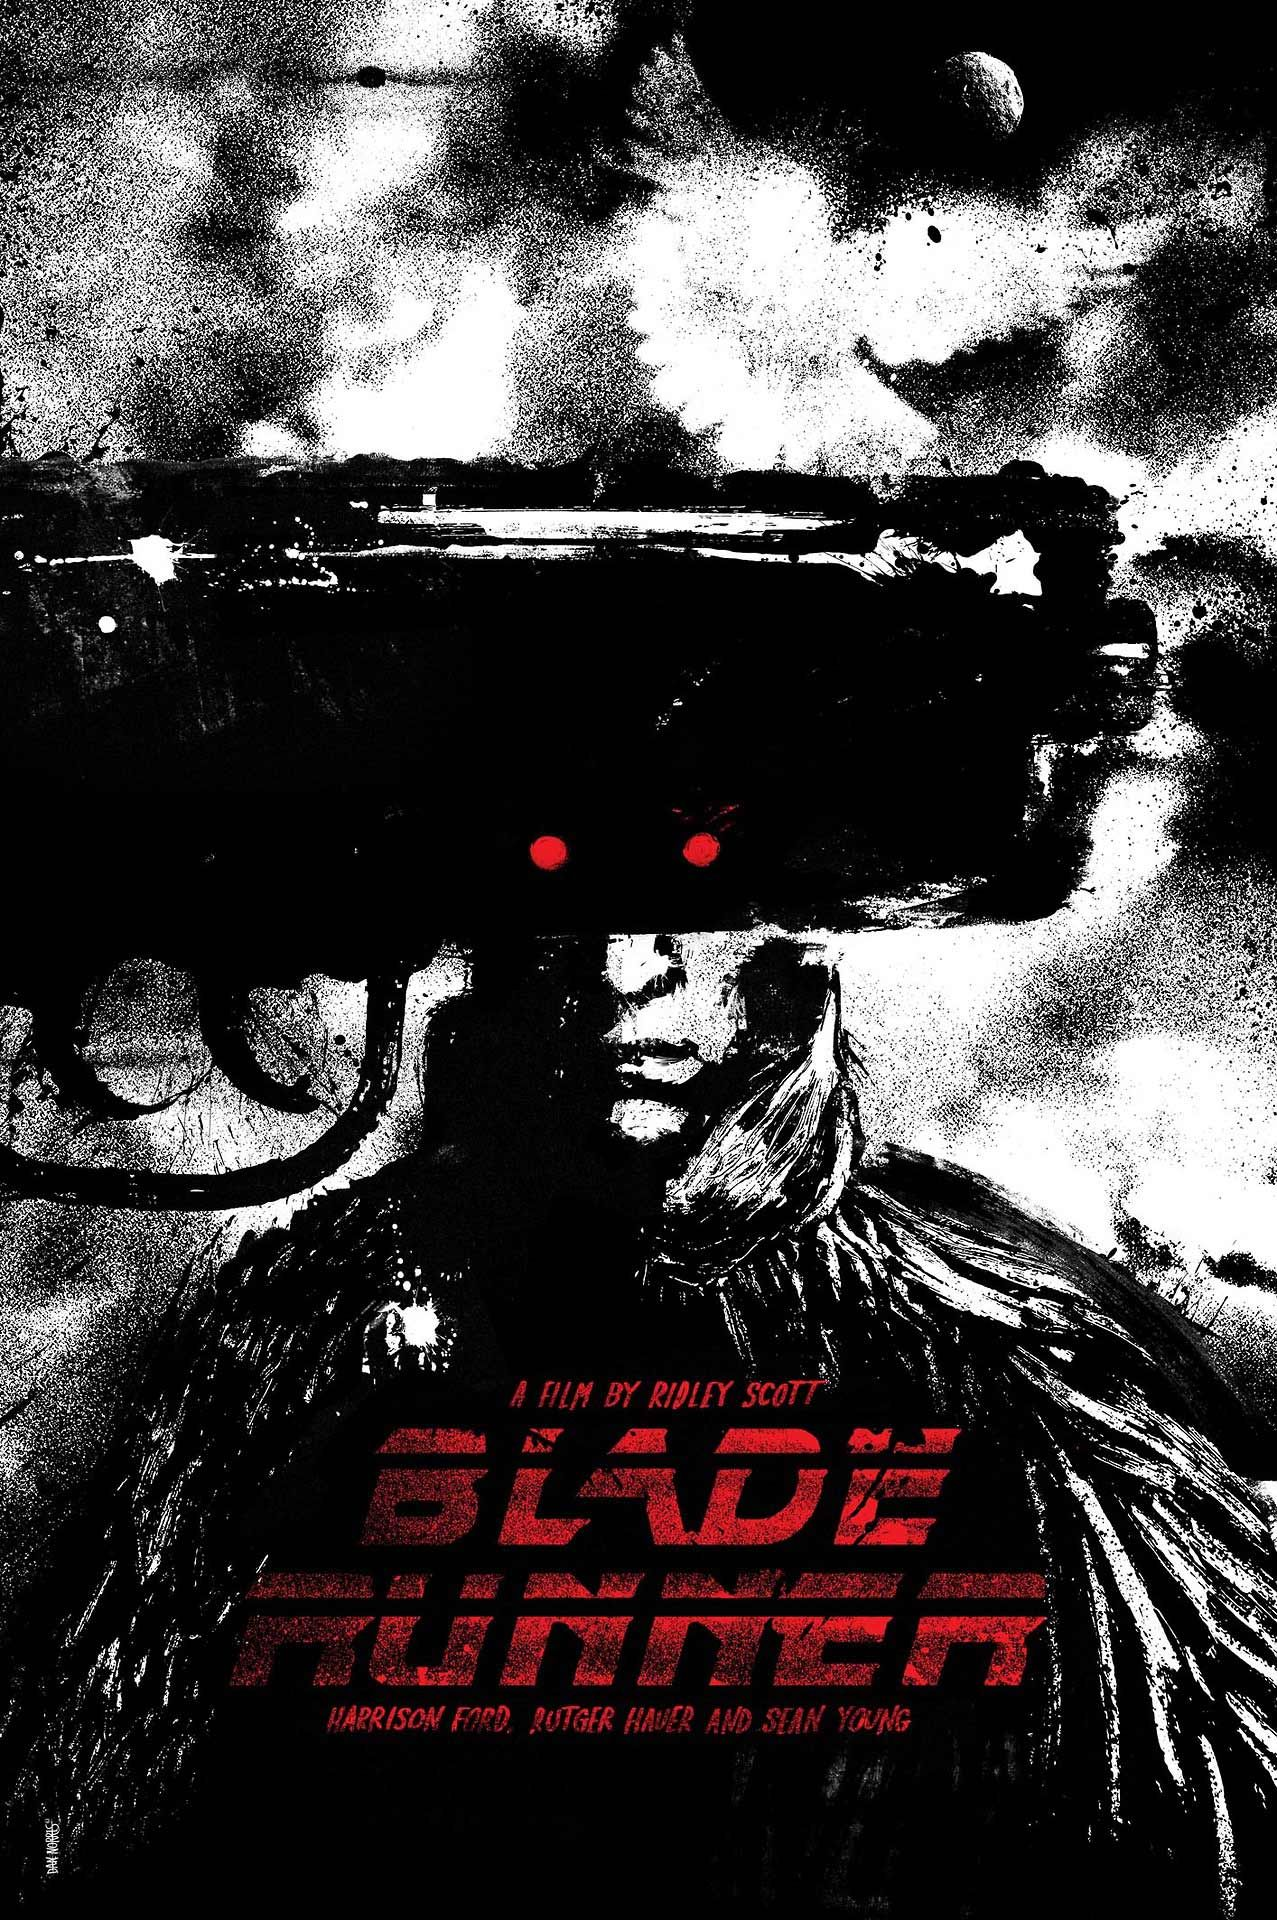 Blade Runner (1982) starring Harrison Ford, Rutger Hauer & Sean Young — new poster by Daniel Norris via http://danielnorris.tumblr.com